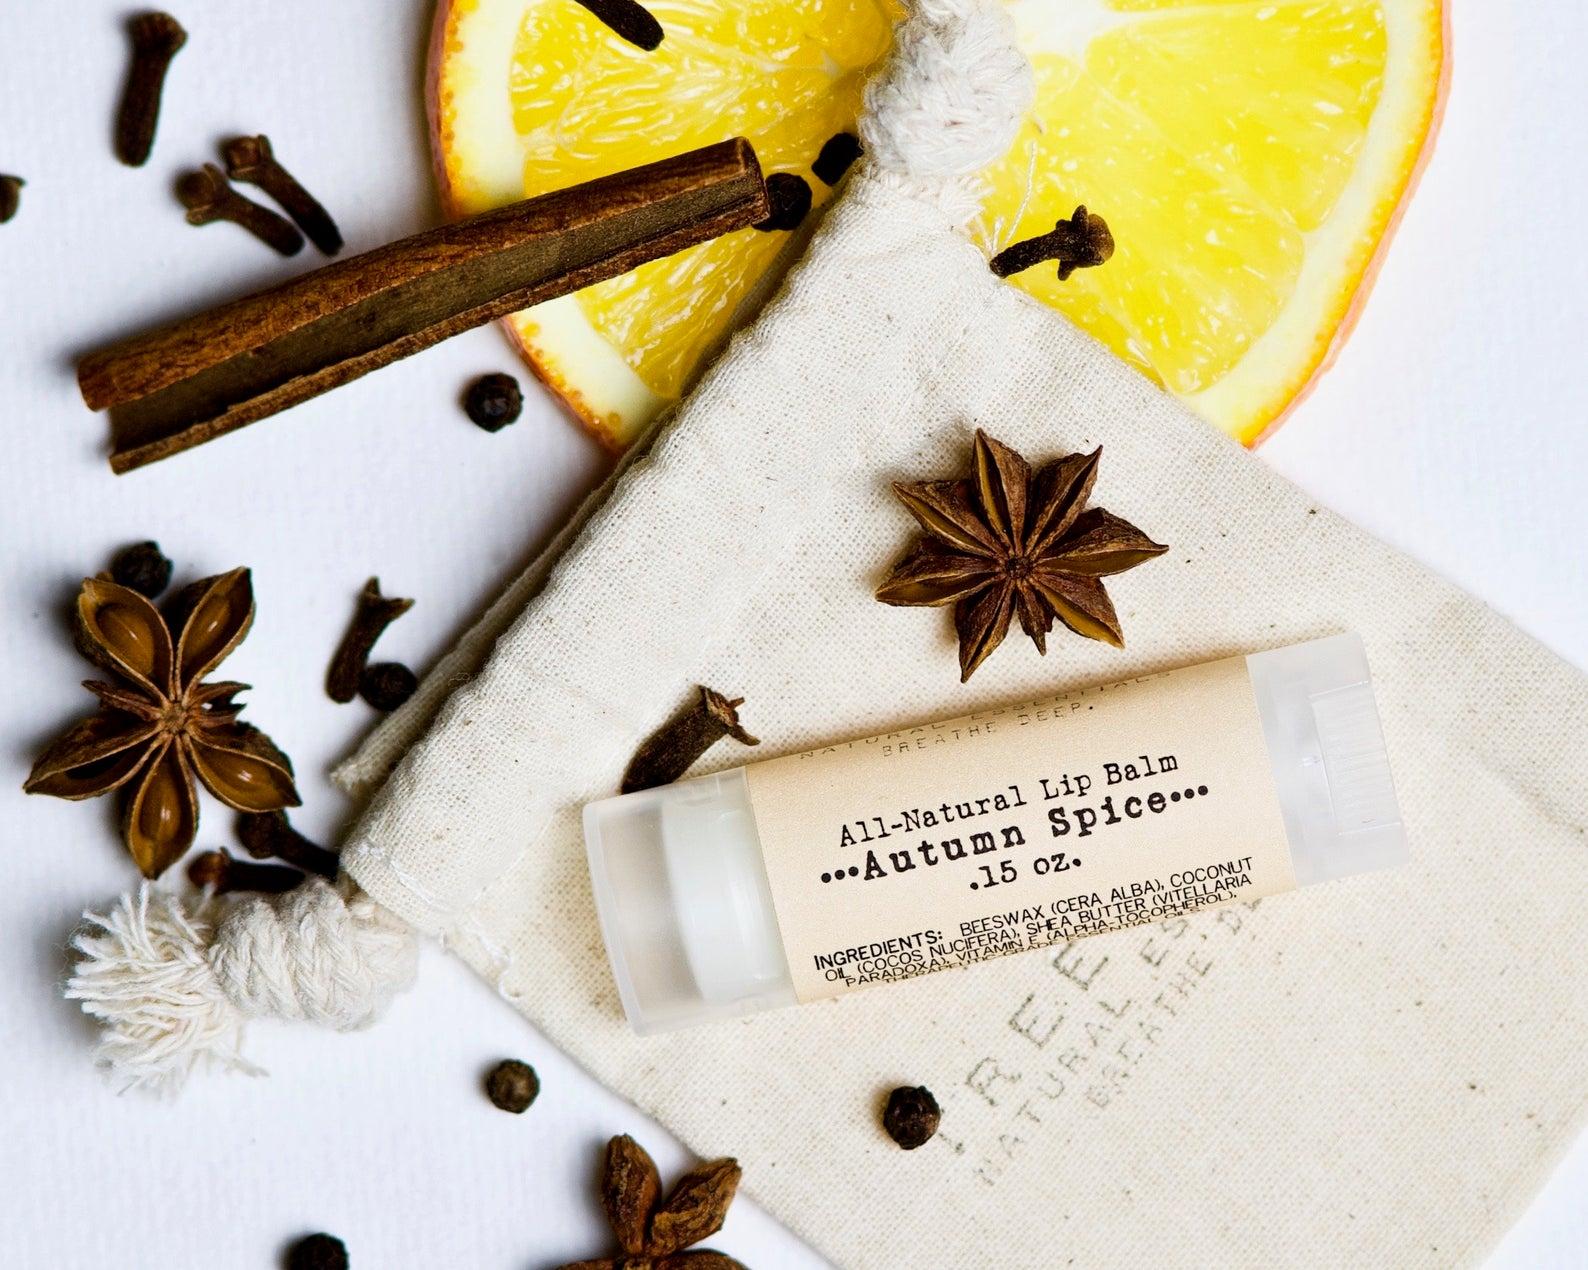 Autumn Spice Organic Lip Balm By Tree Snail